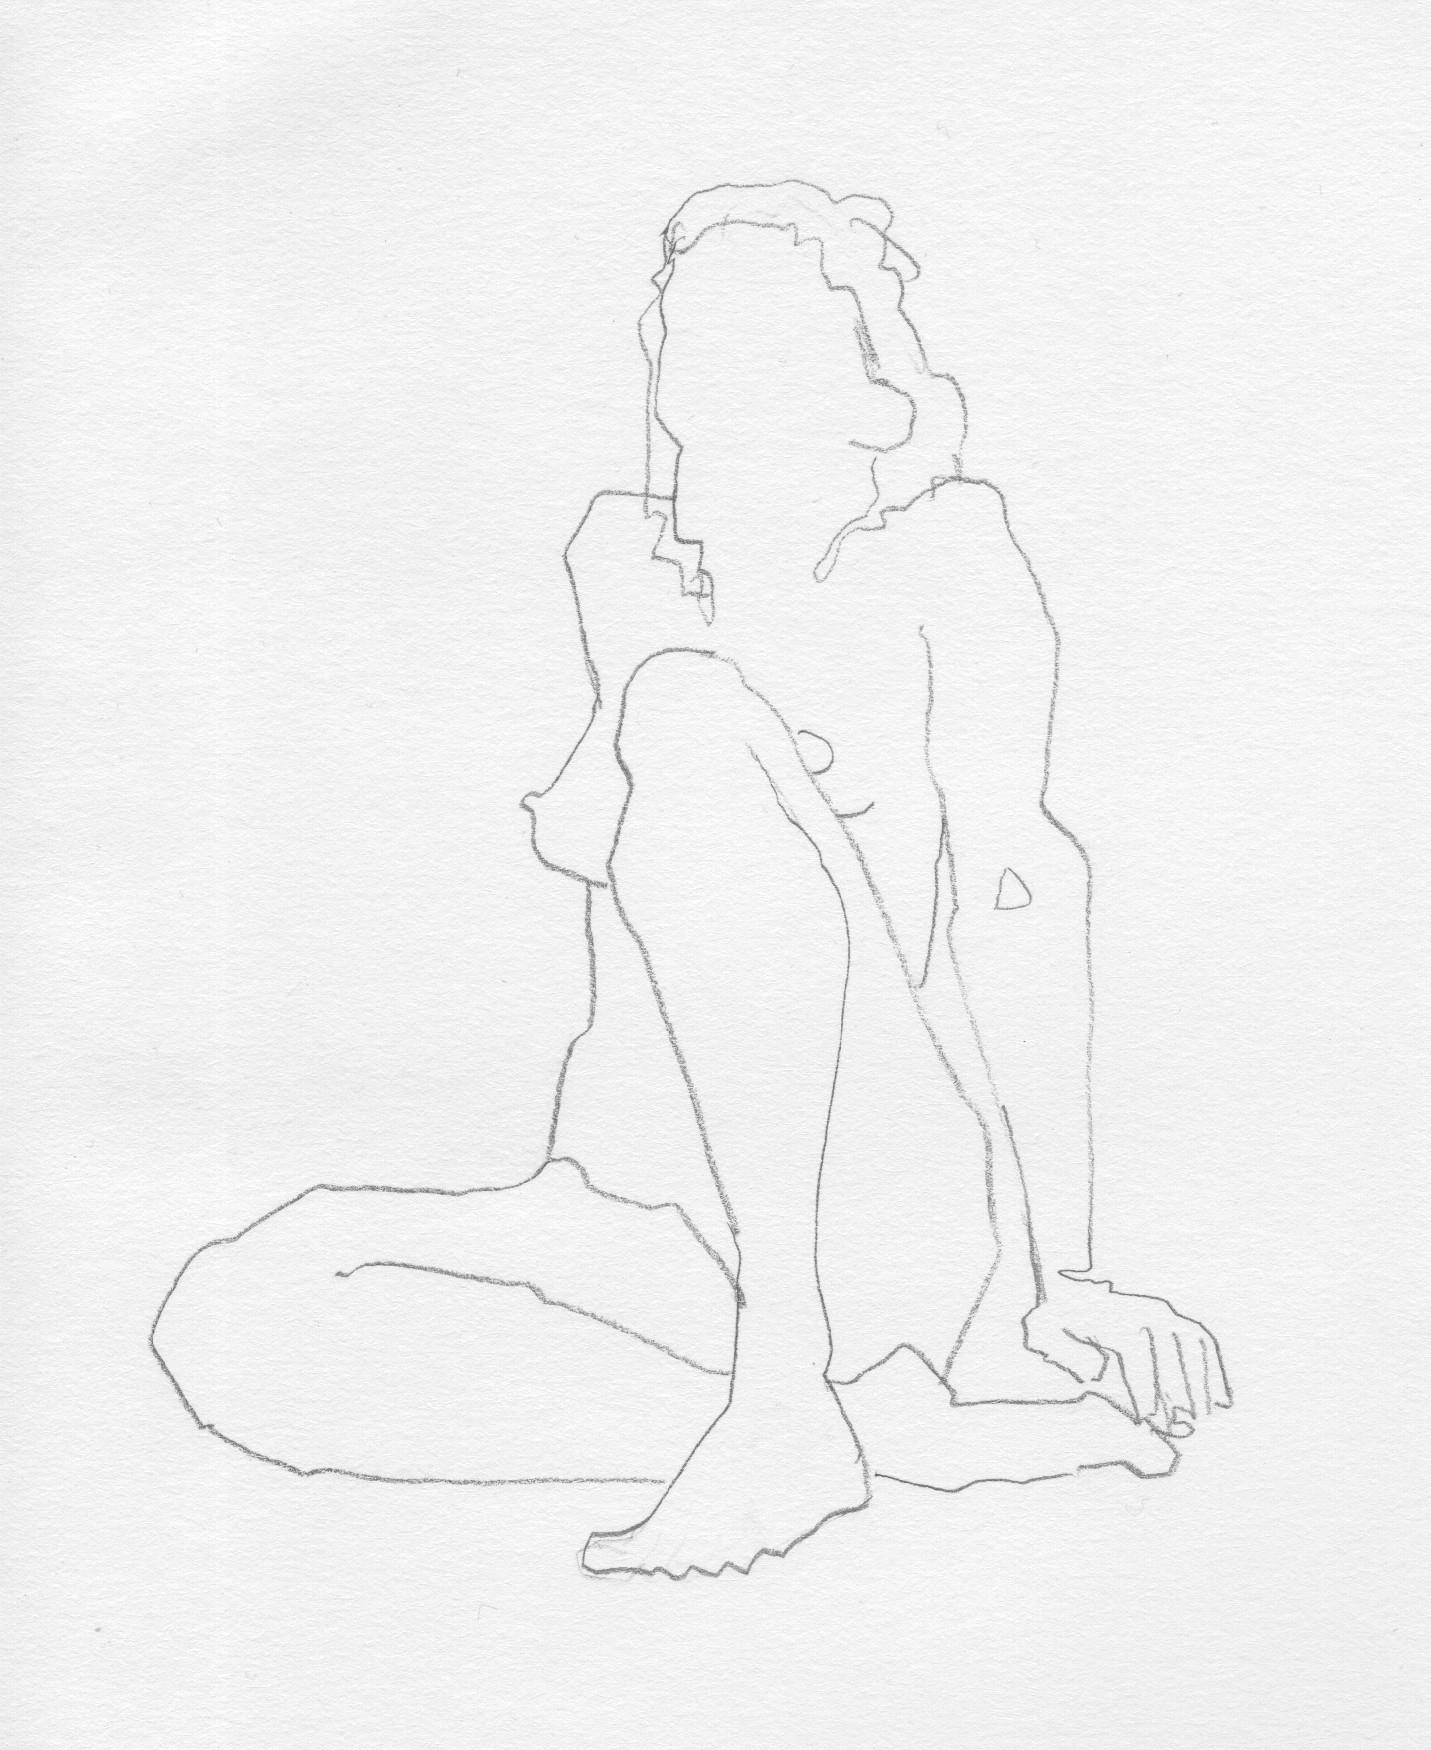 2016_Sketch_F-Beudin_Angelique_08